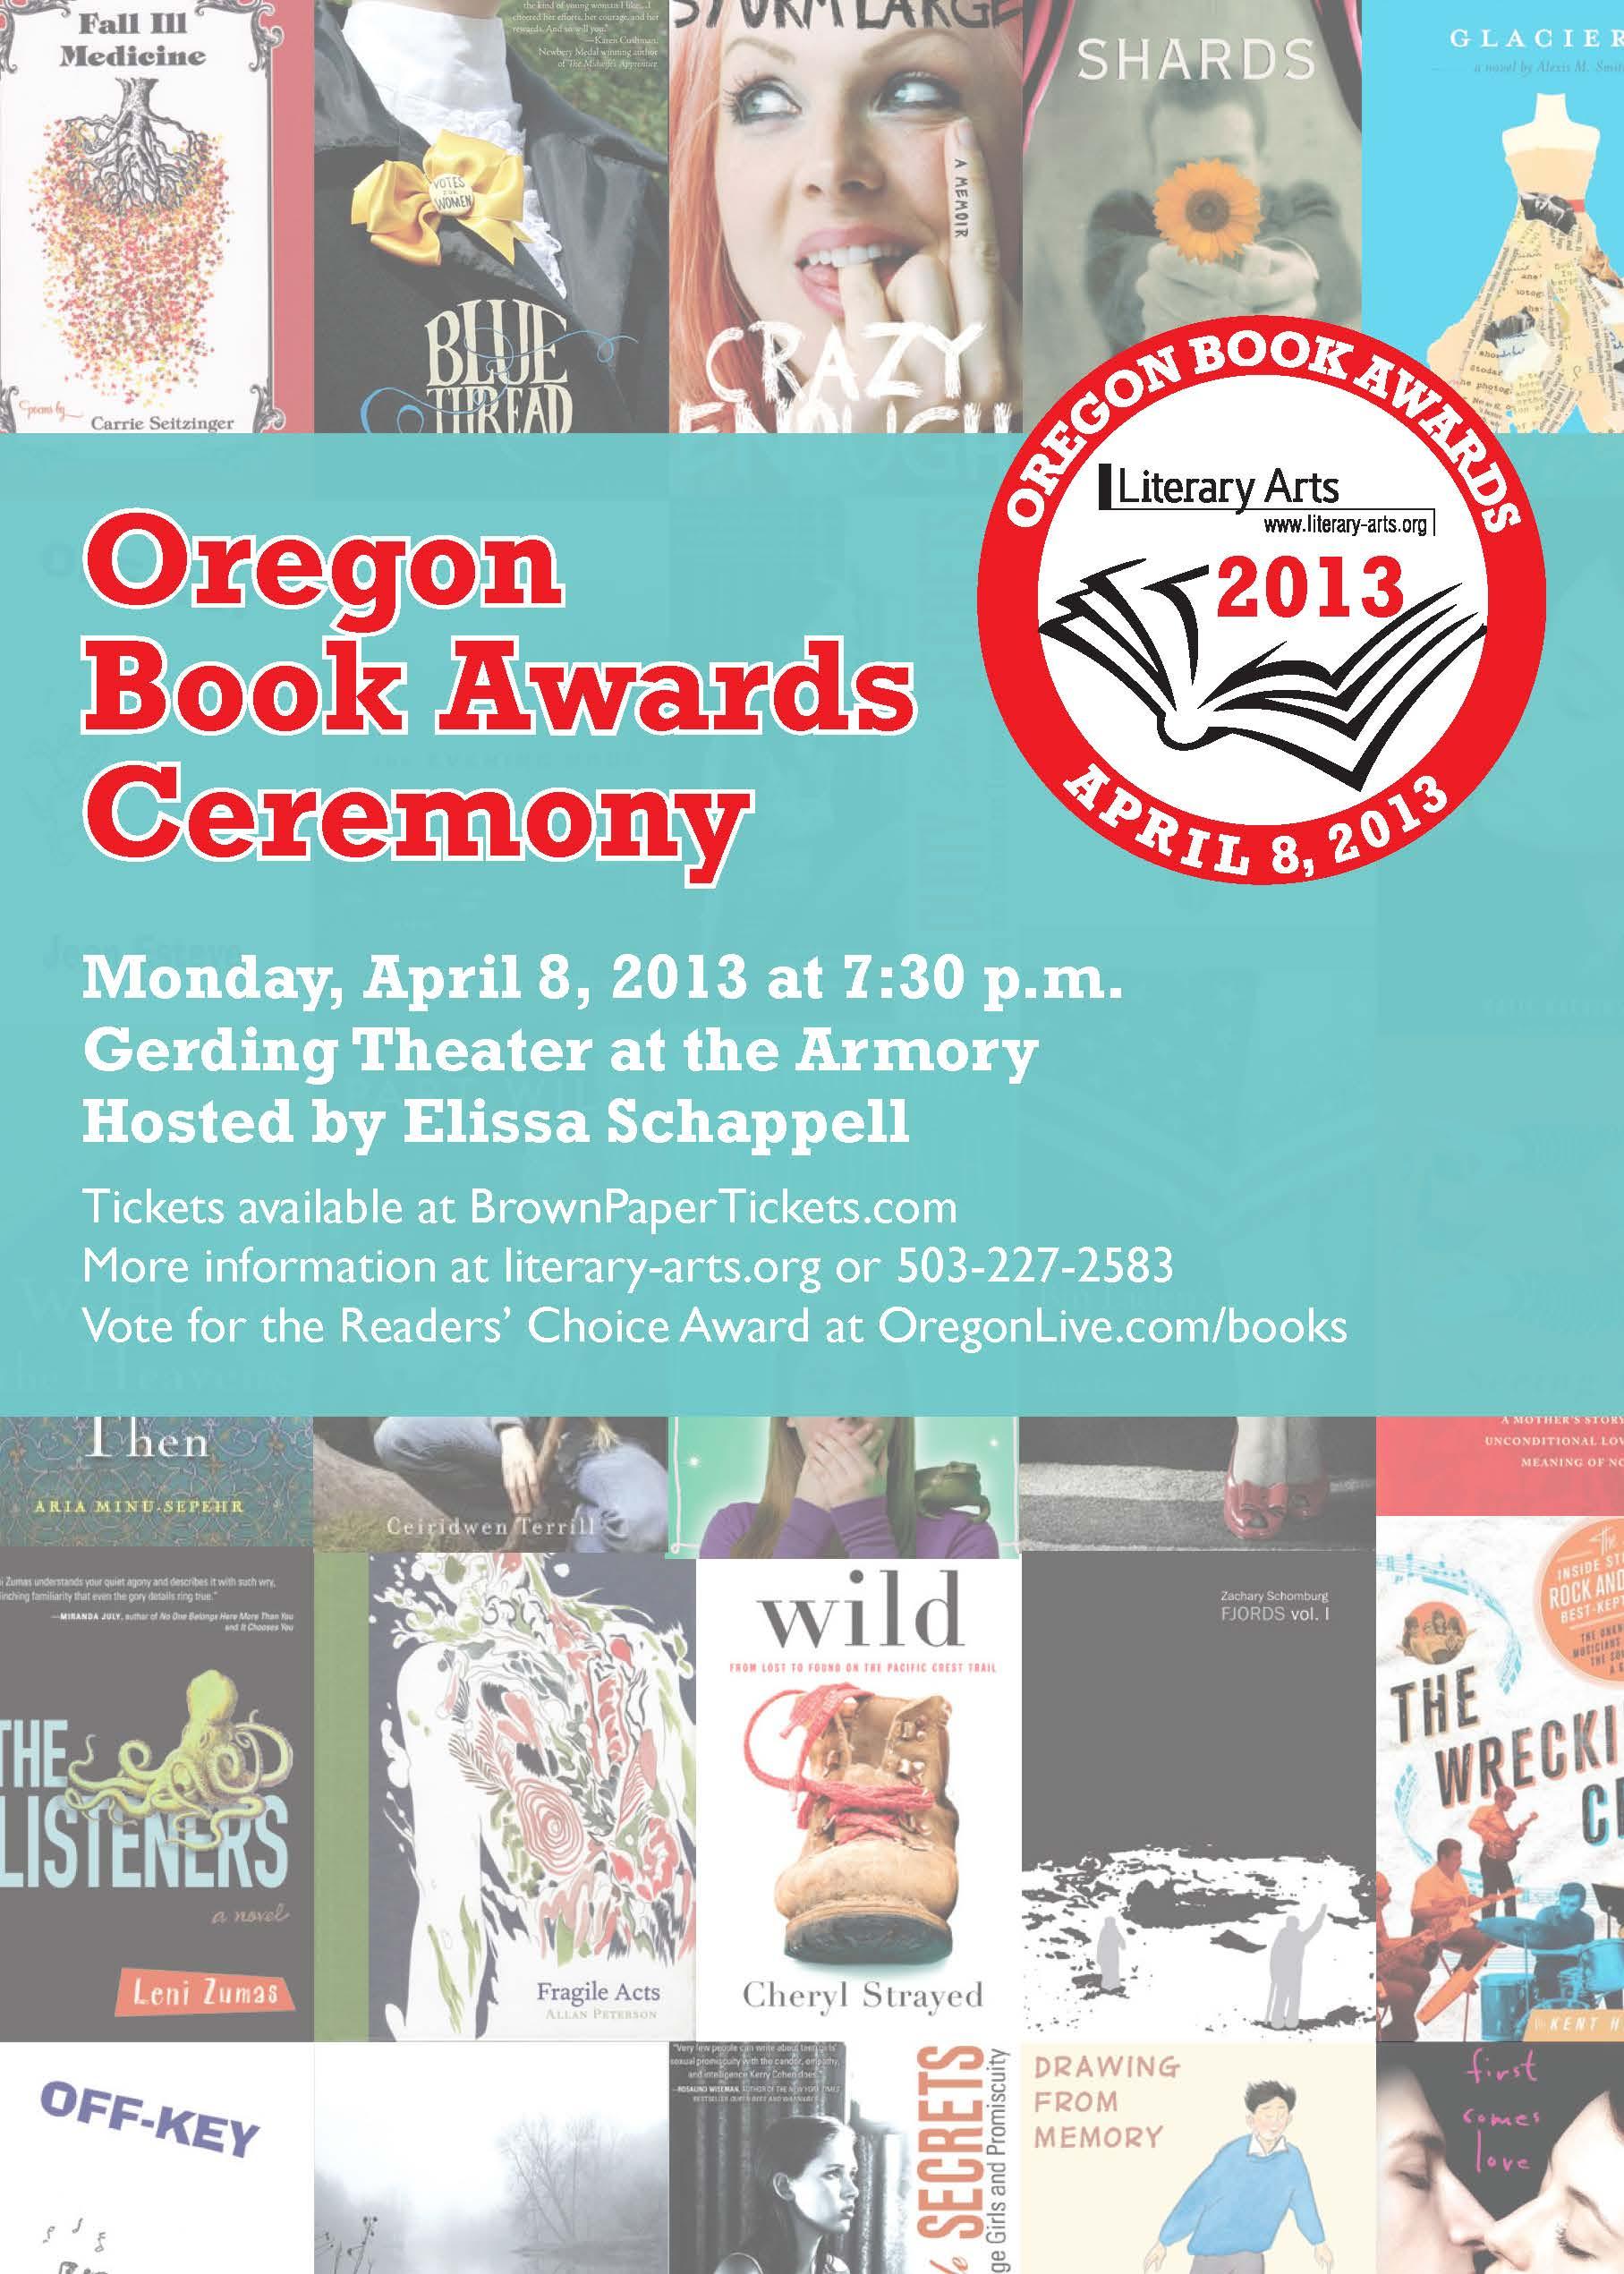 Postcard for the 2013 Oregon Book Awards